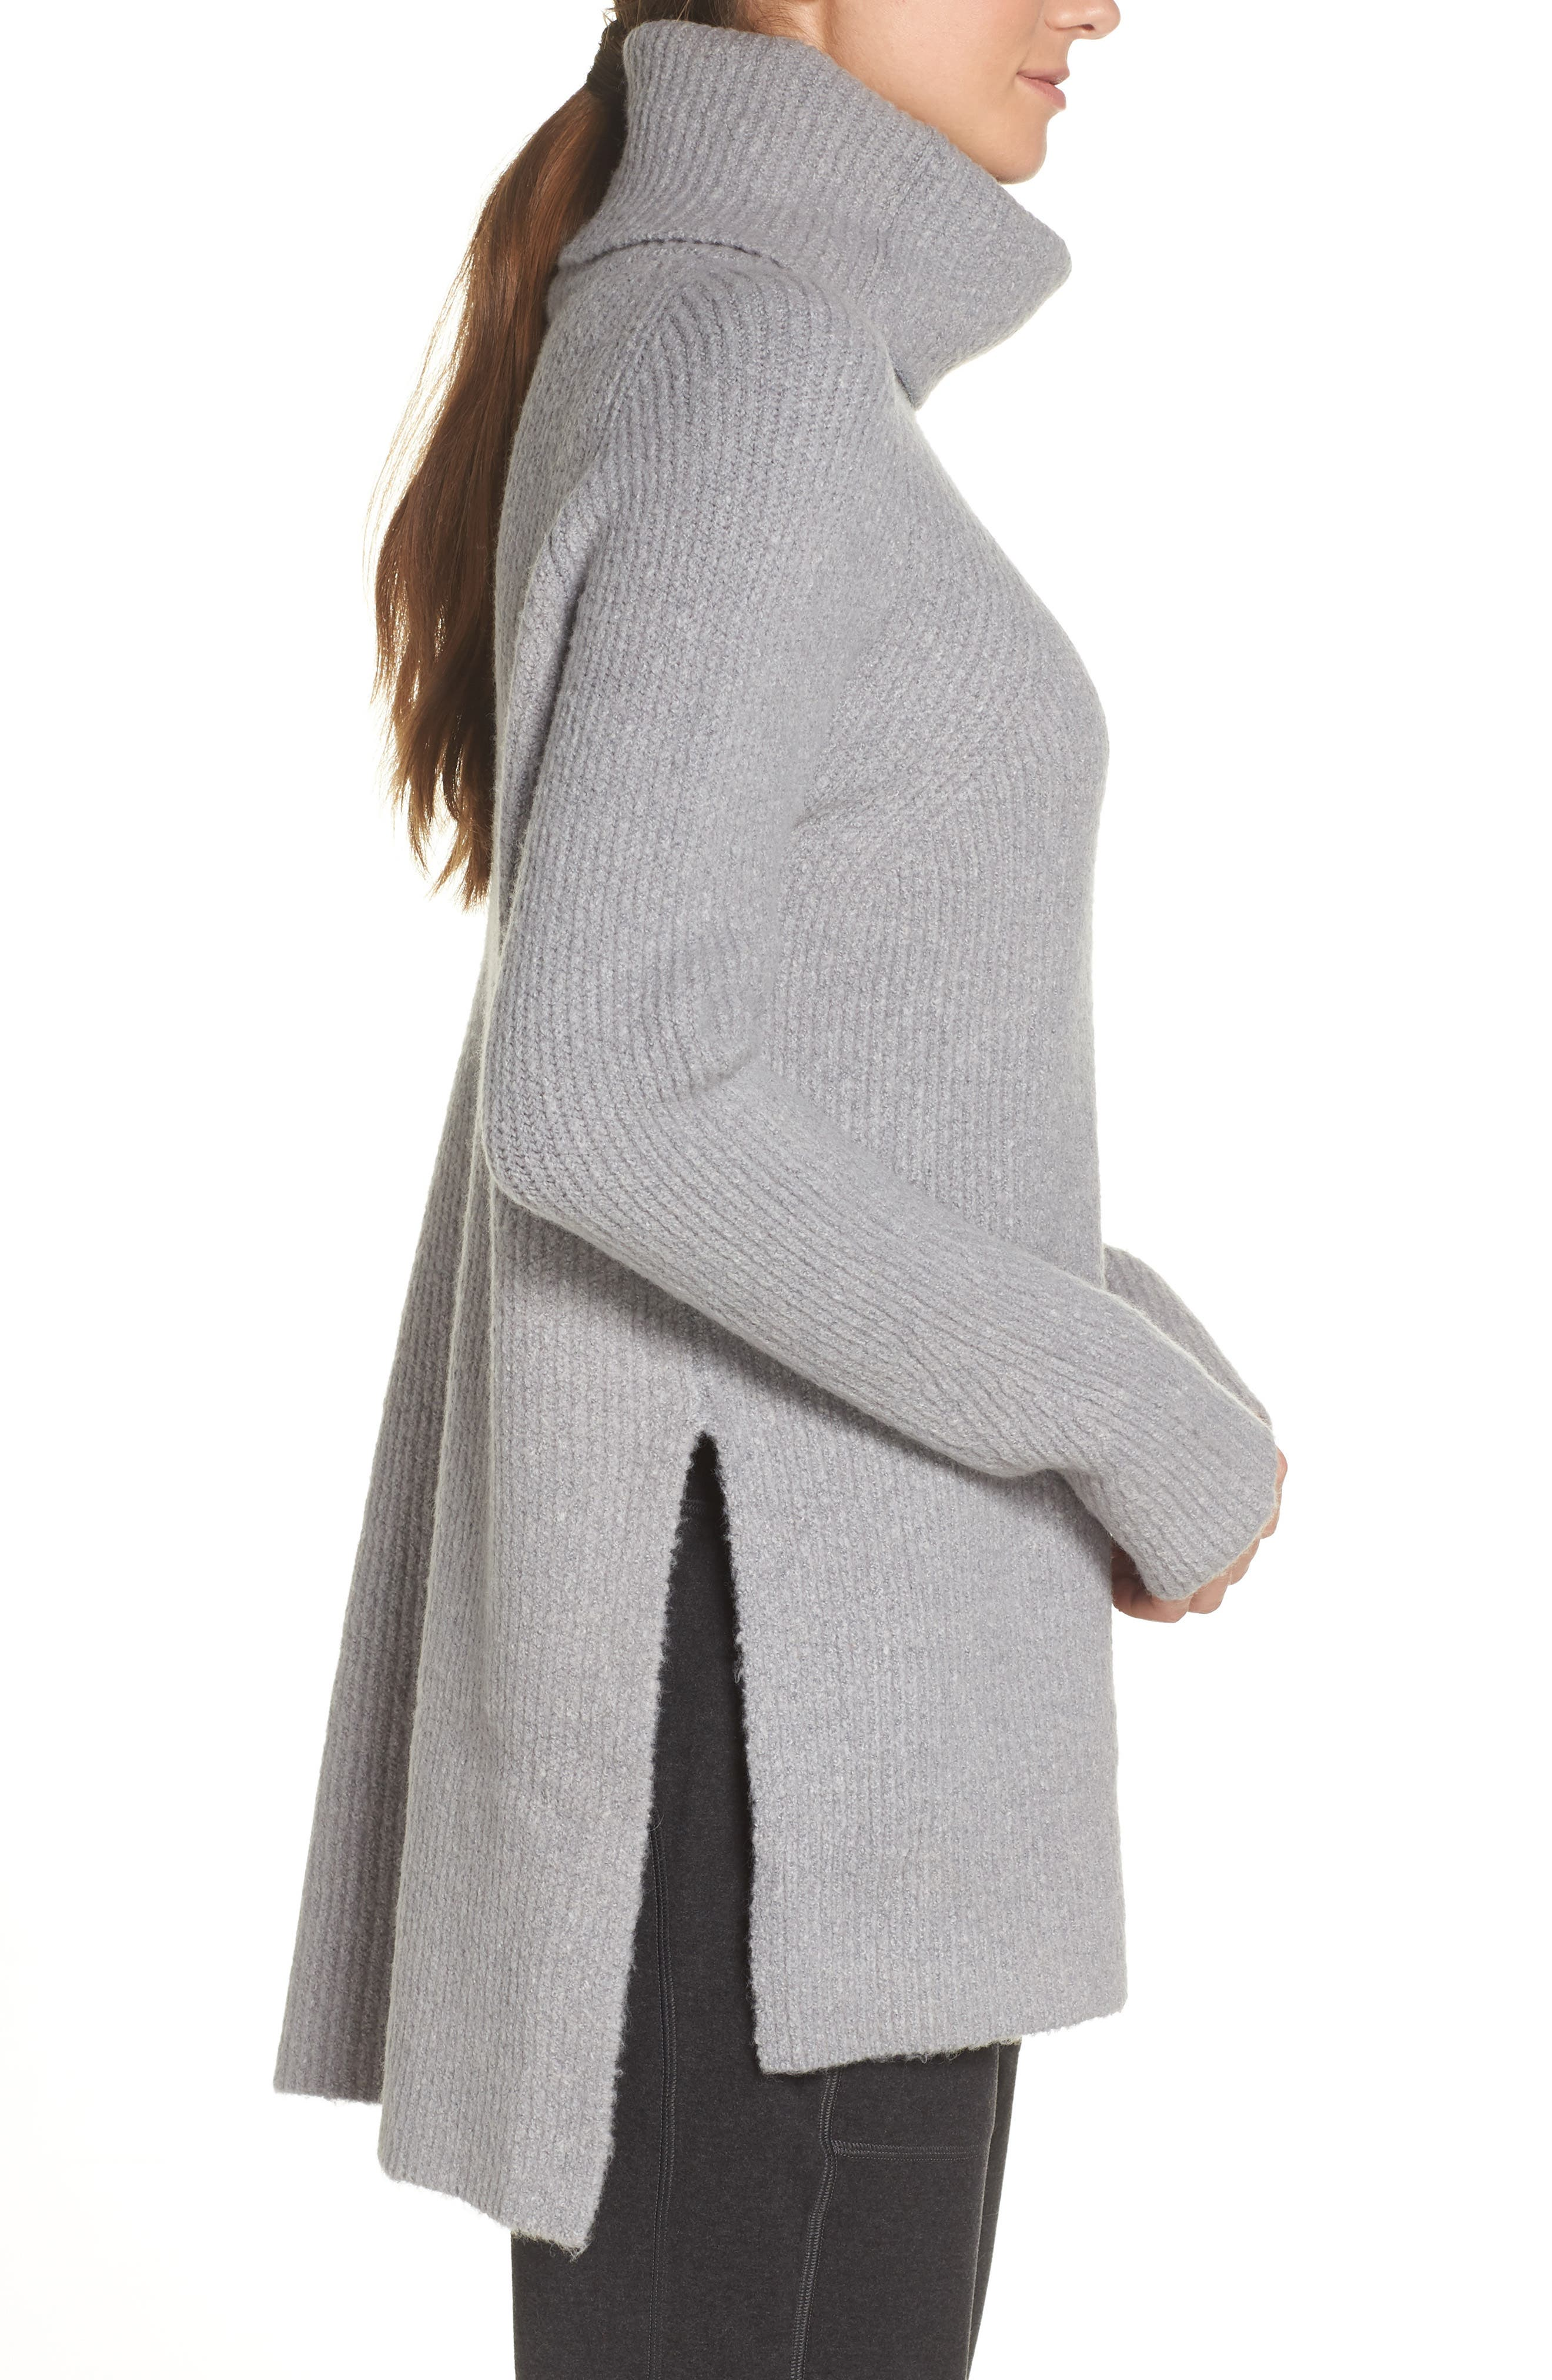 Shakti Oversize Sweater,                             Alternate thumbnail 3, color,                             SILVER GREY MARL